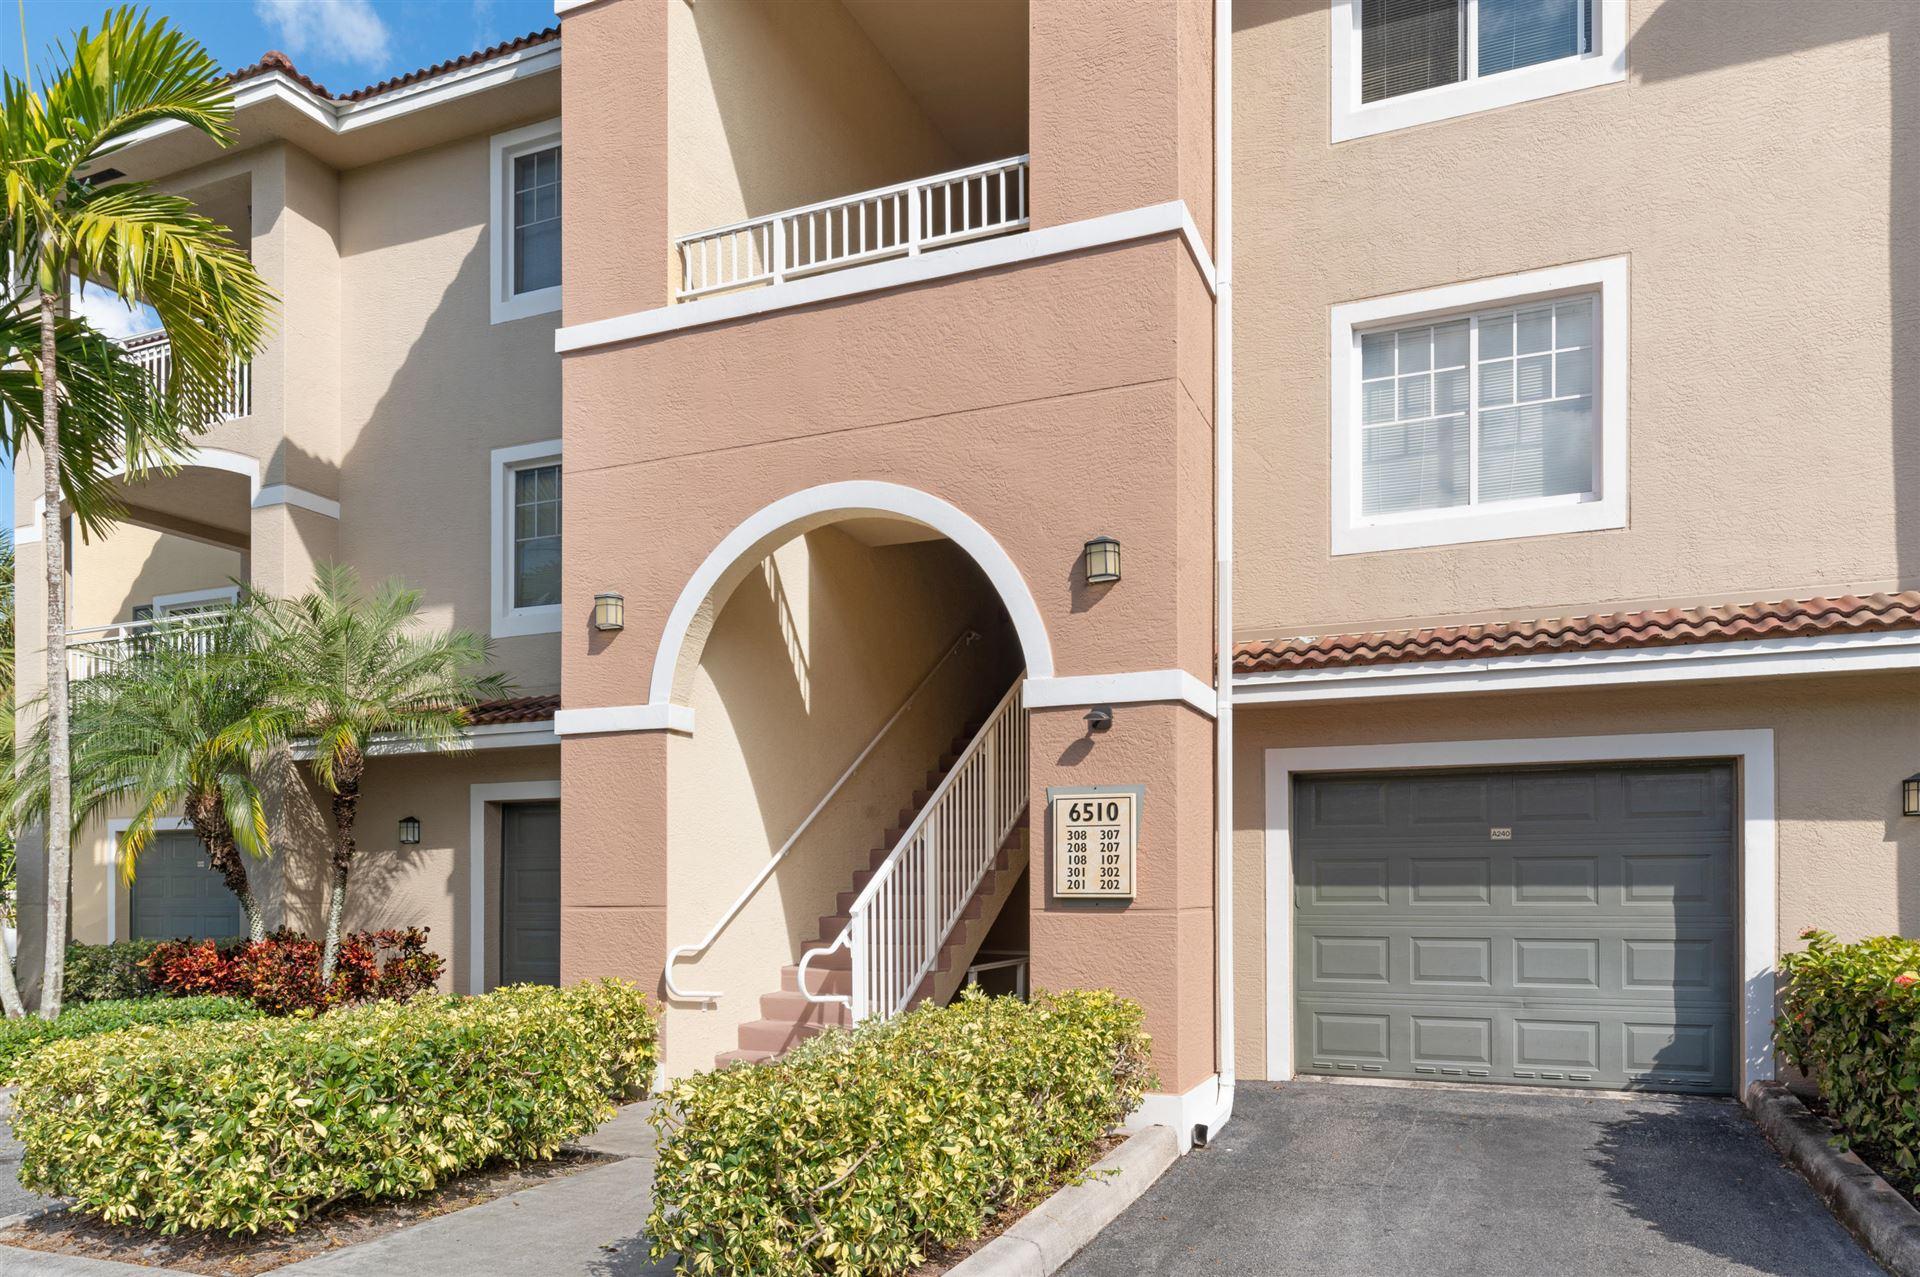 6510 Emerald Dunes Drive #208, West Palm Beach, FL 33411 - #: RX-10686444